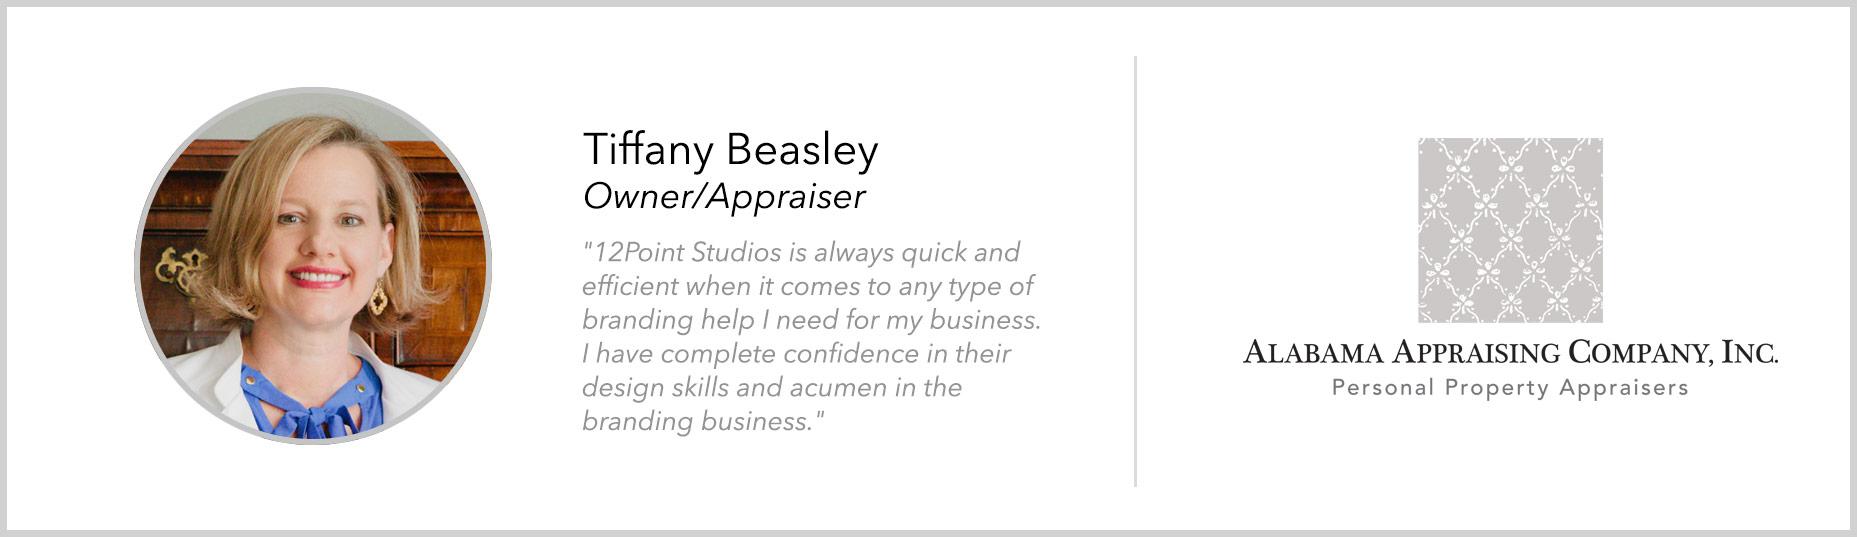 Tiffany_Beasley_testimonial